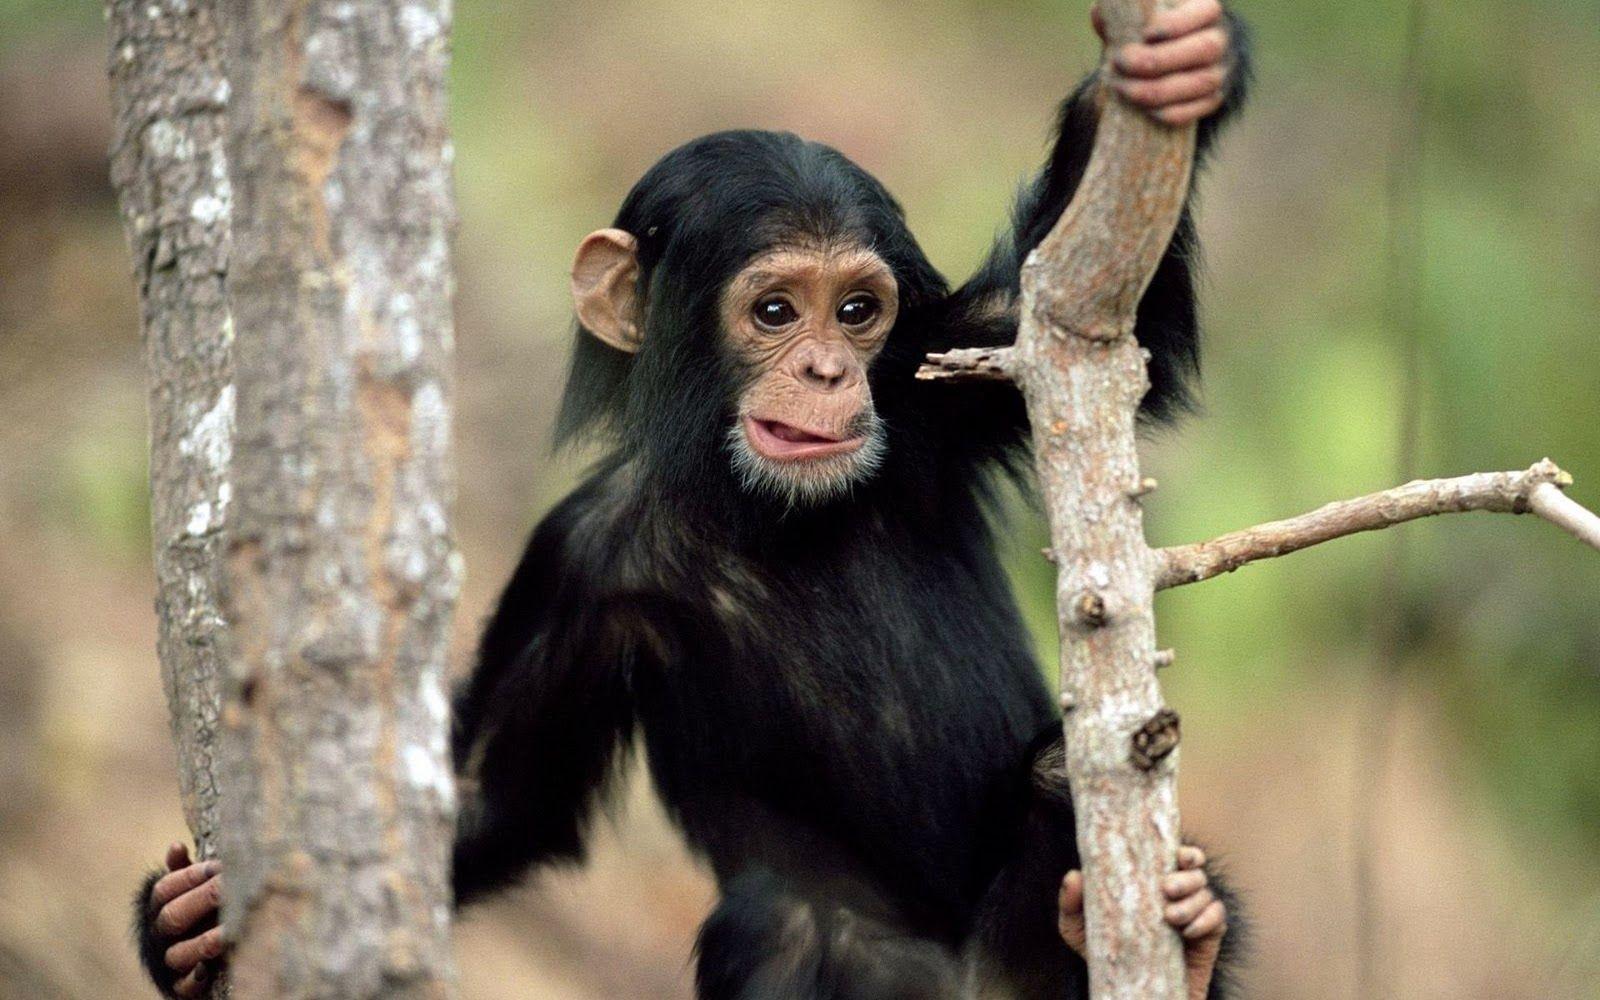 Cute Monkeys Wallpapers Group (64+)